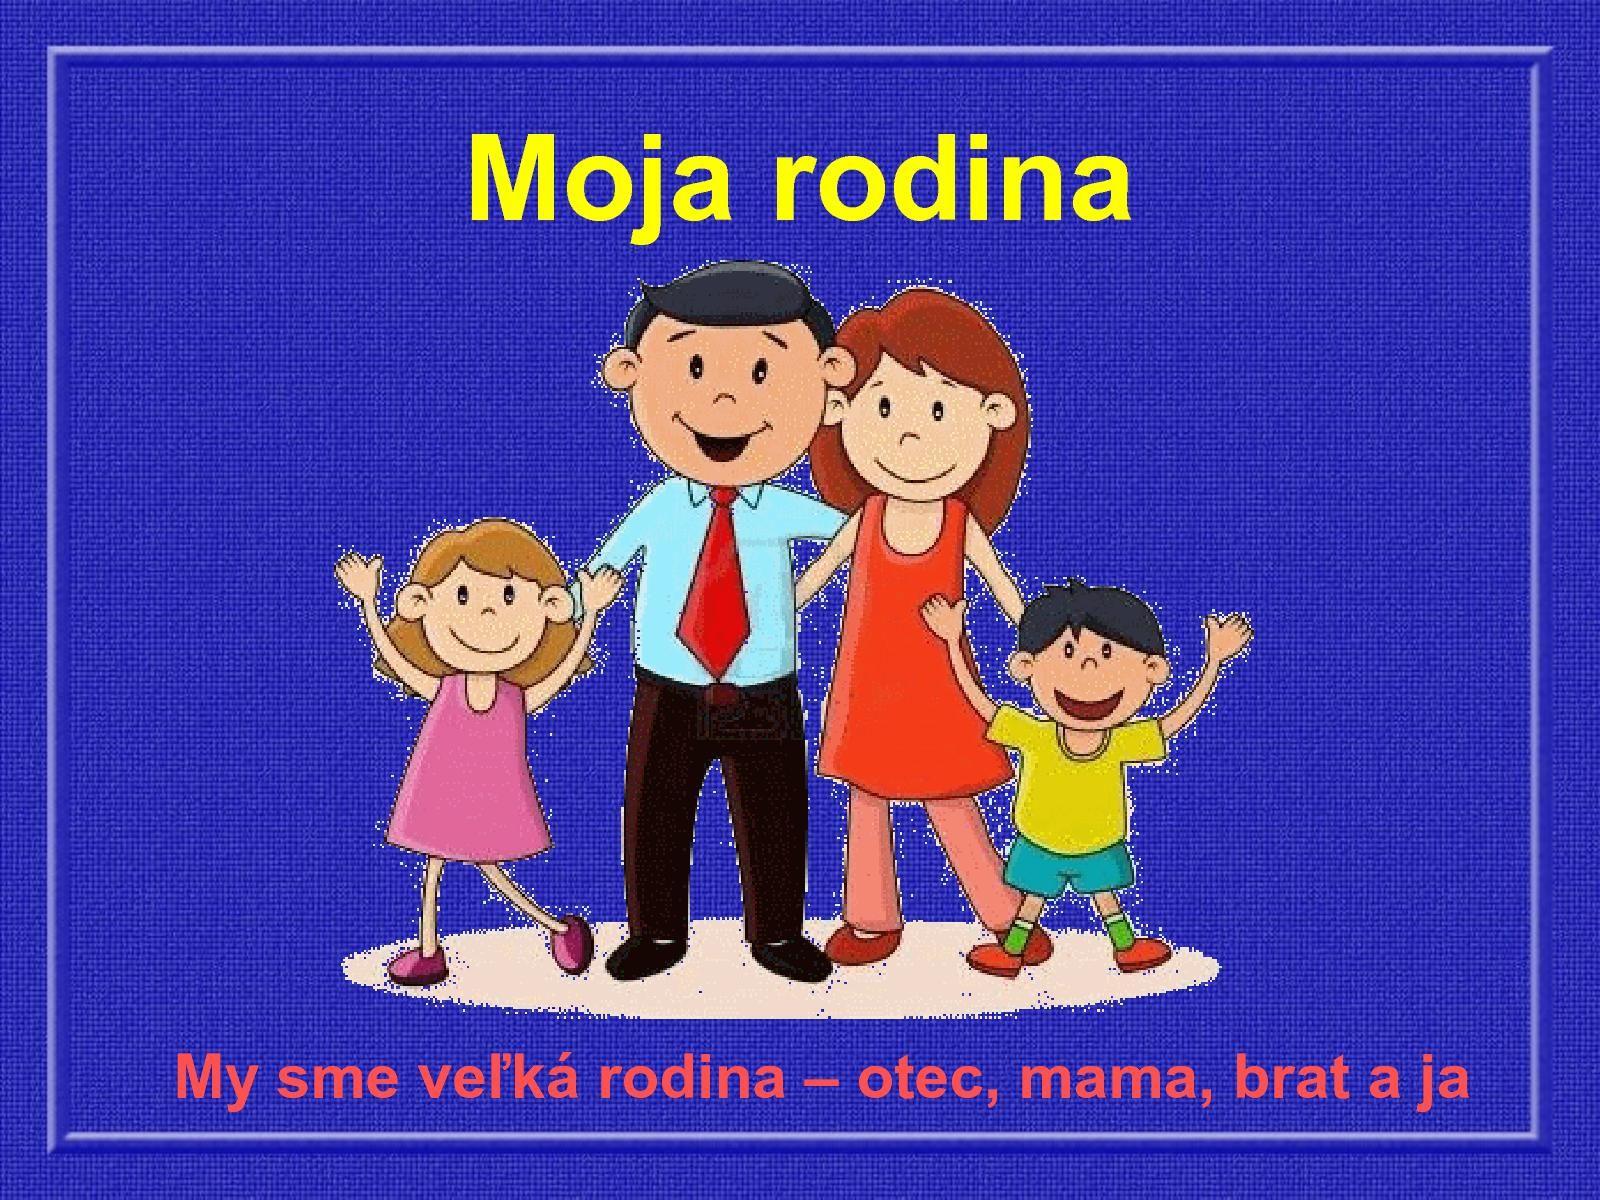 Moja Rodina Clenovia Rodiny Brat Education Sme